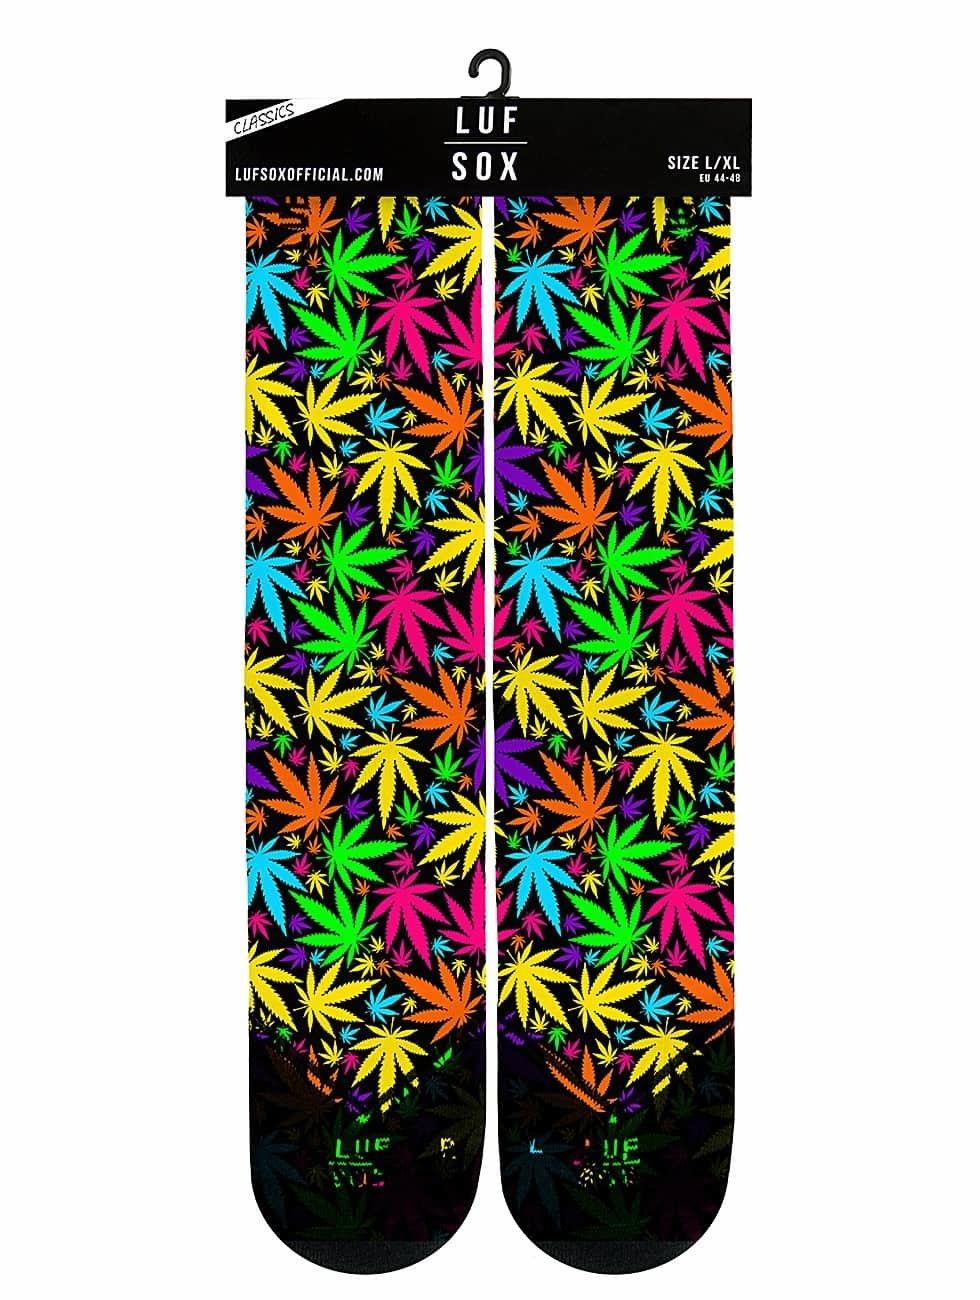 LUF SOX Skarpetki Maui Waui kolorowy